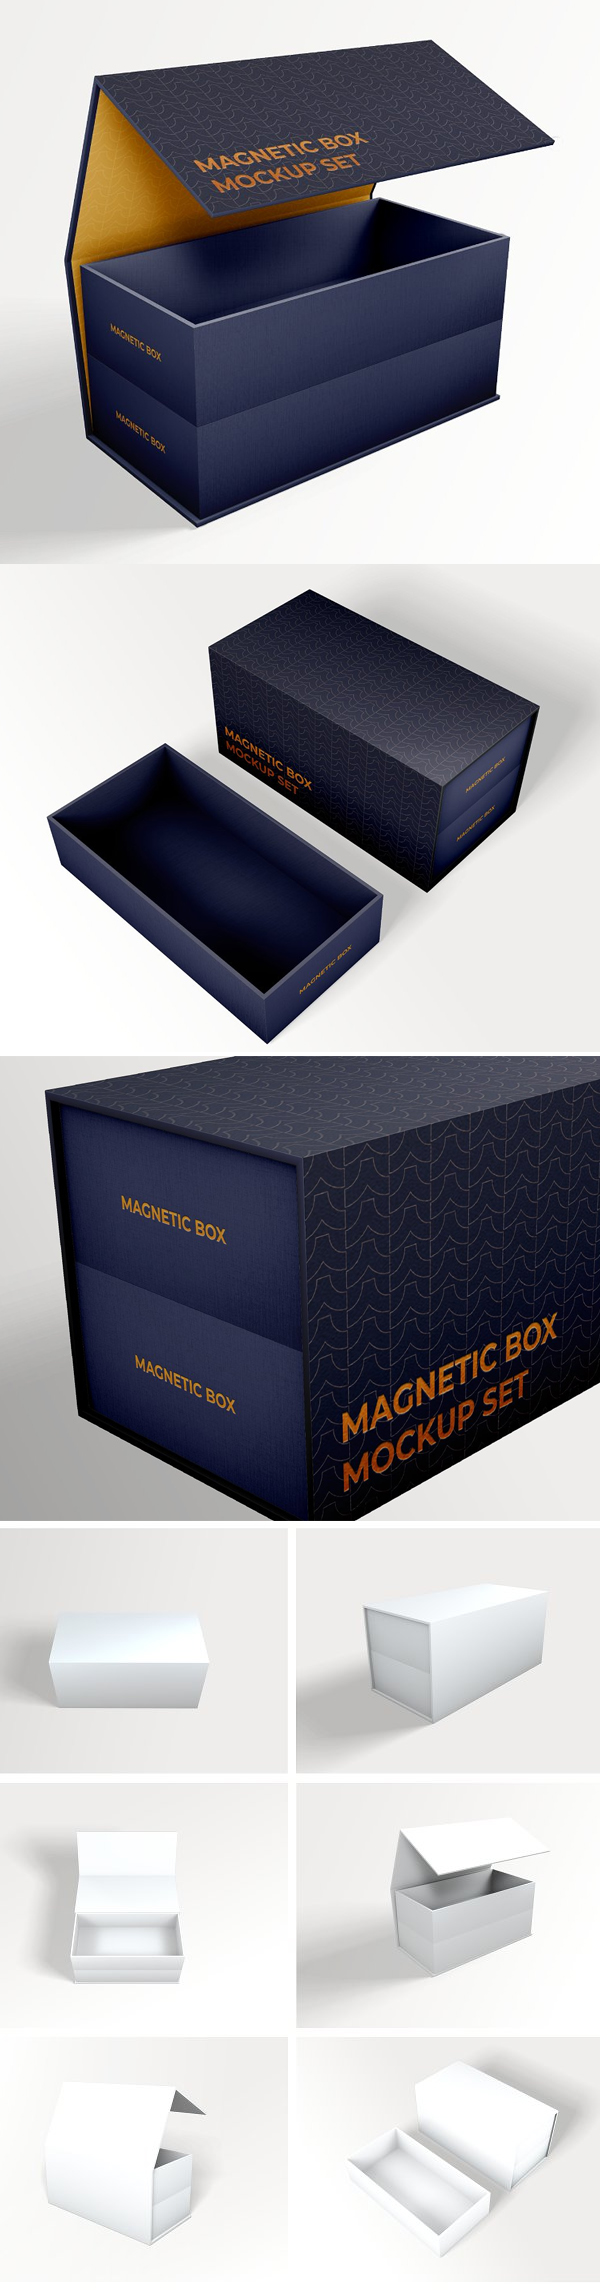 Foldable Magnetic Box Mockup Set